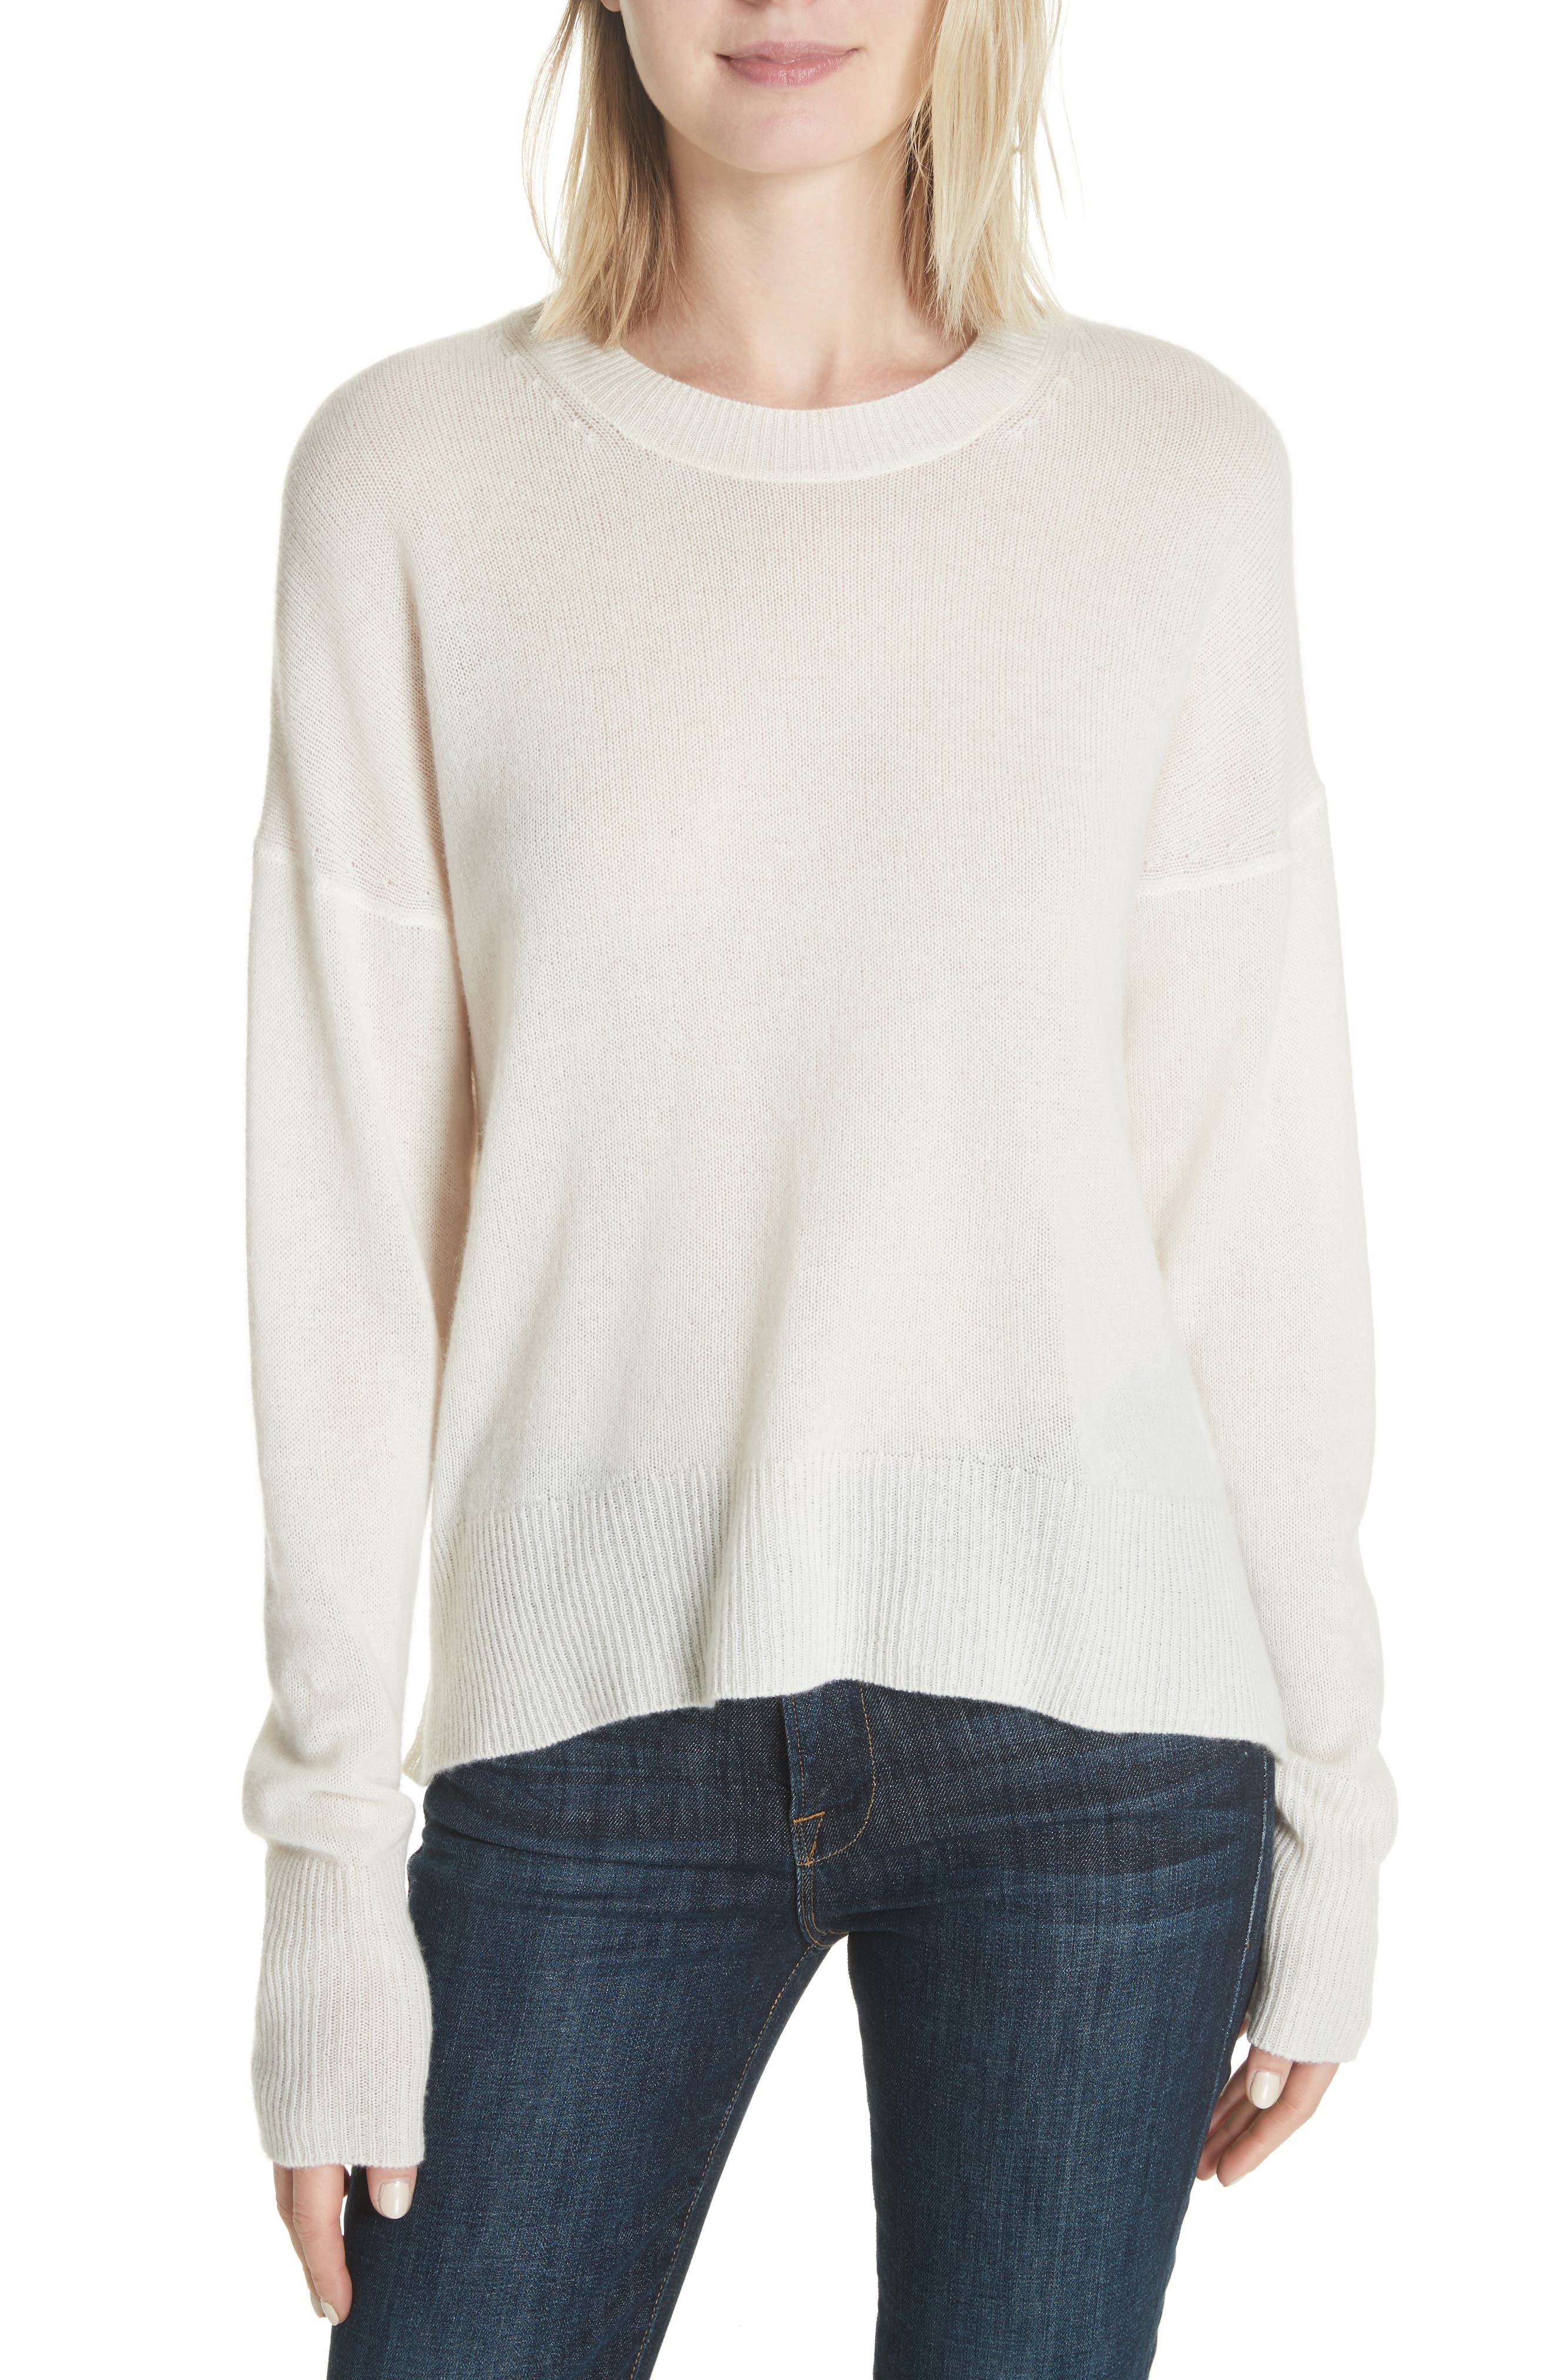 Karenia L Cashmere Sweater,                         Main,                         color, Ivory